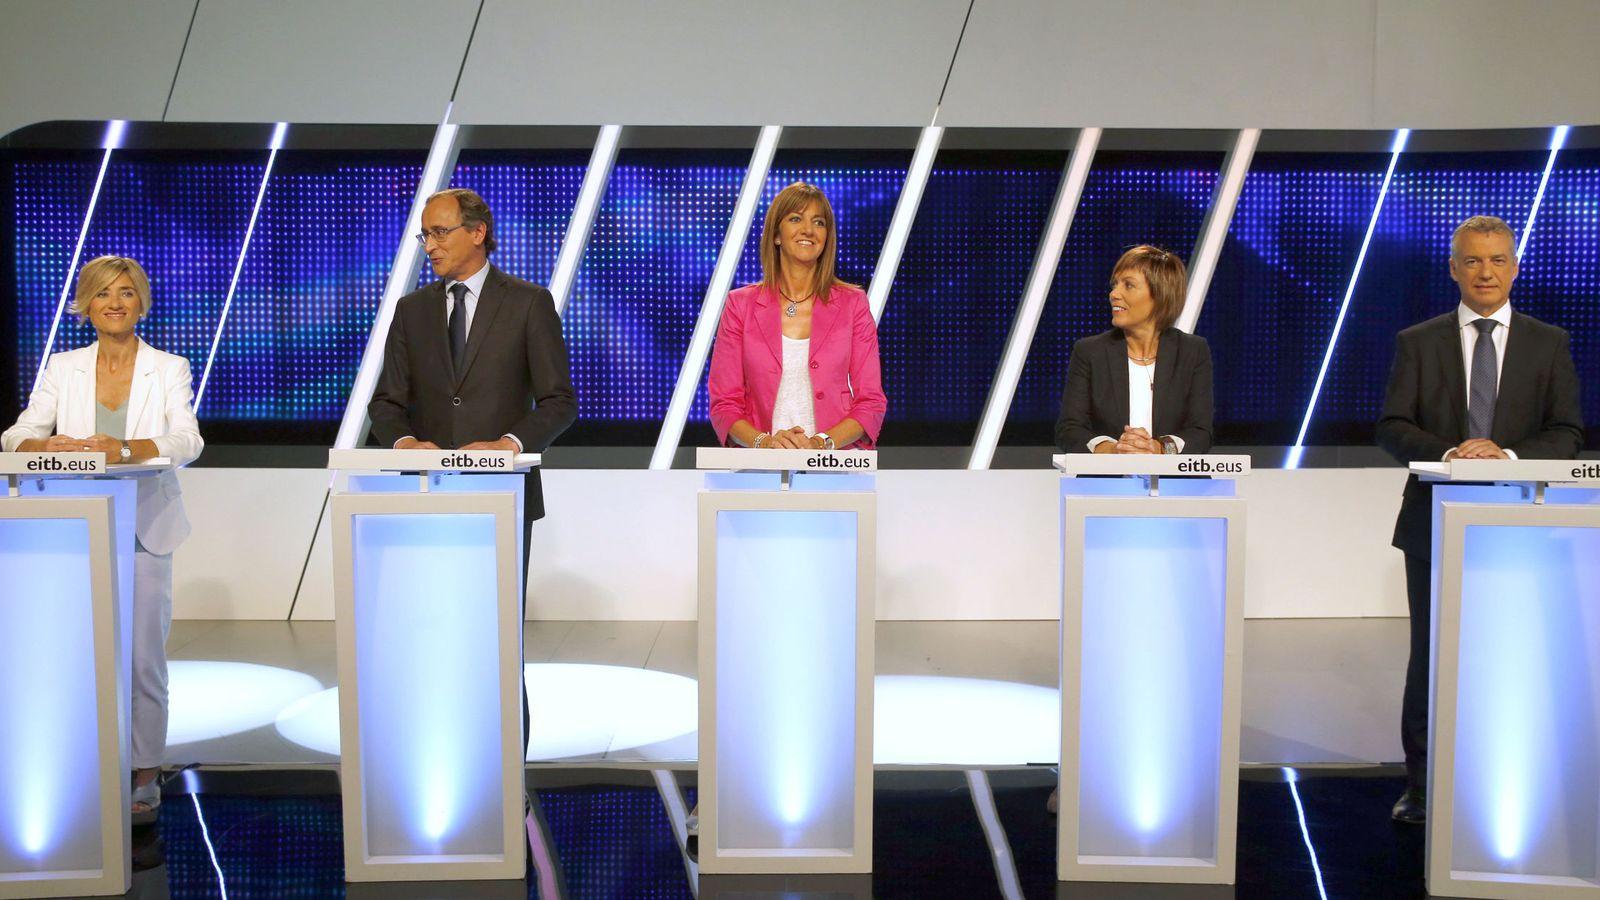 Foto: Los candidatos a lendakari del PNV, Iñigo Urkullu; Podemos, Pili Zabala ; PSE, Idoia Mendia, y PP, Alfonso Alonso, y la cabeza de lista de Bildu por Álava, Miren Larrion. (EFE)